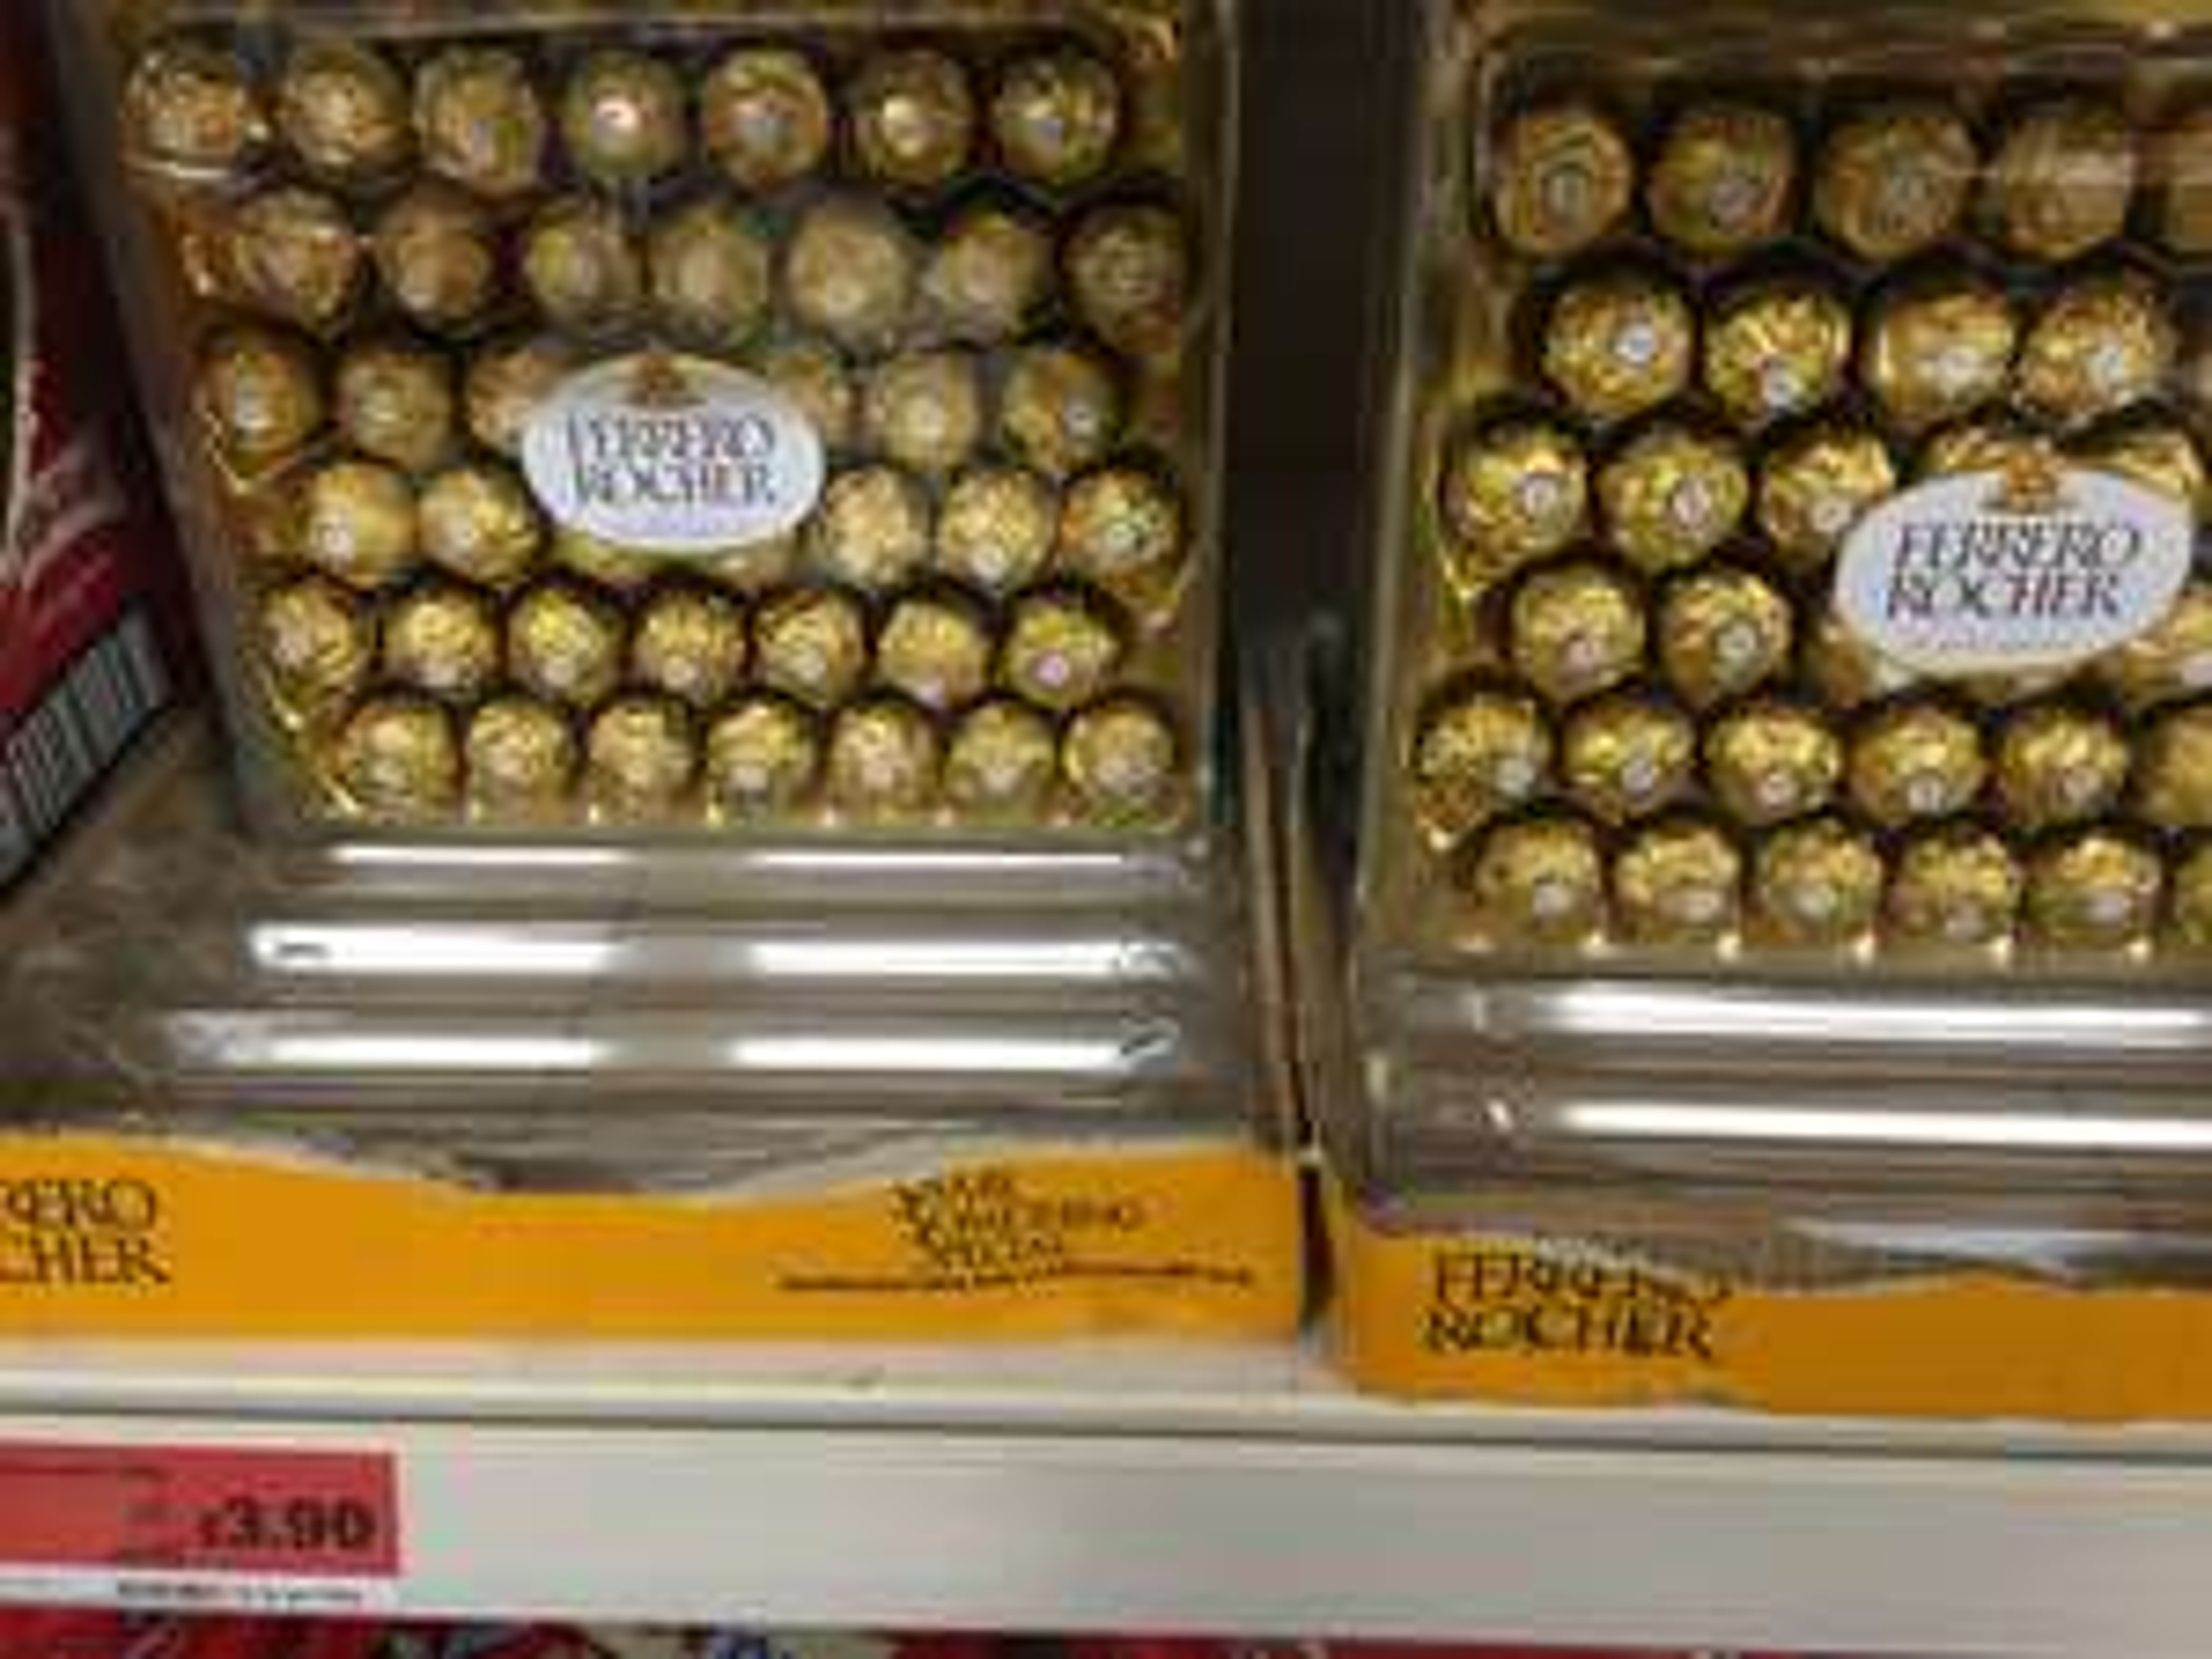 Ferrero Rocher 42 piece Sainsbury's - £3.90